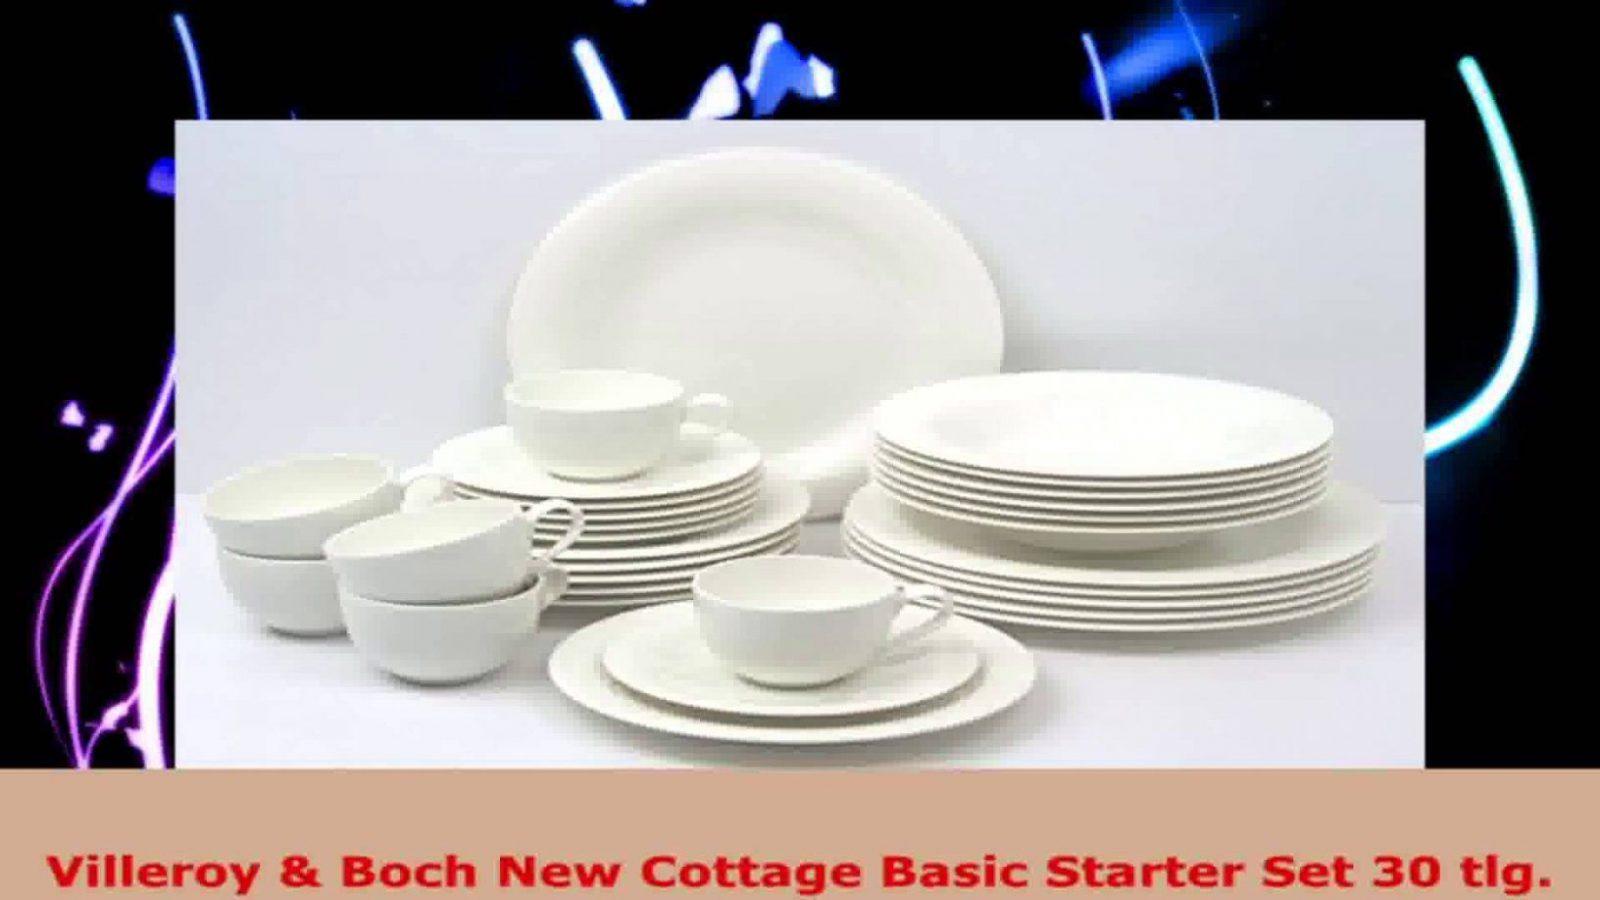 Villeroy Boch New Cottage Basic Starter Set 30 Tlg  Youtube von Villeroy & Boch Royal Basic Set 30 Teilig Bild